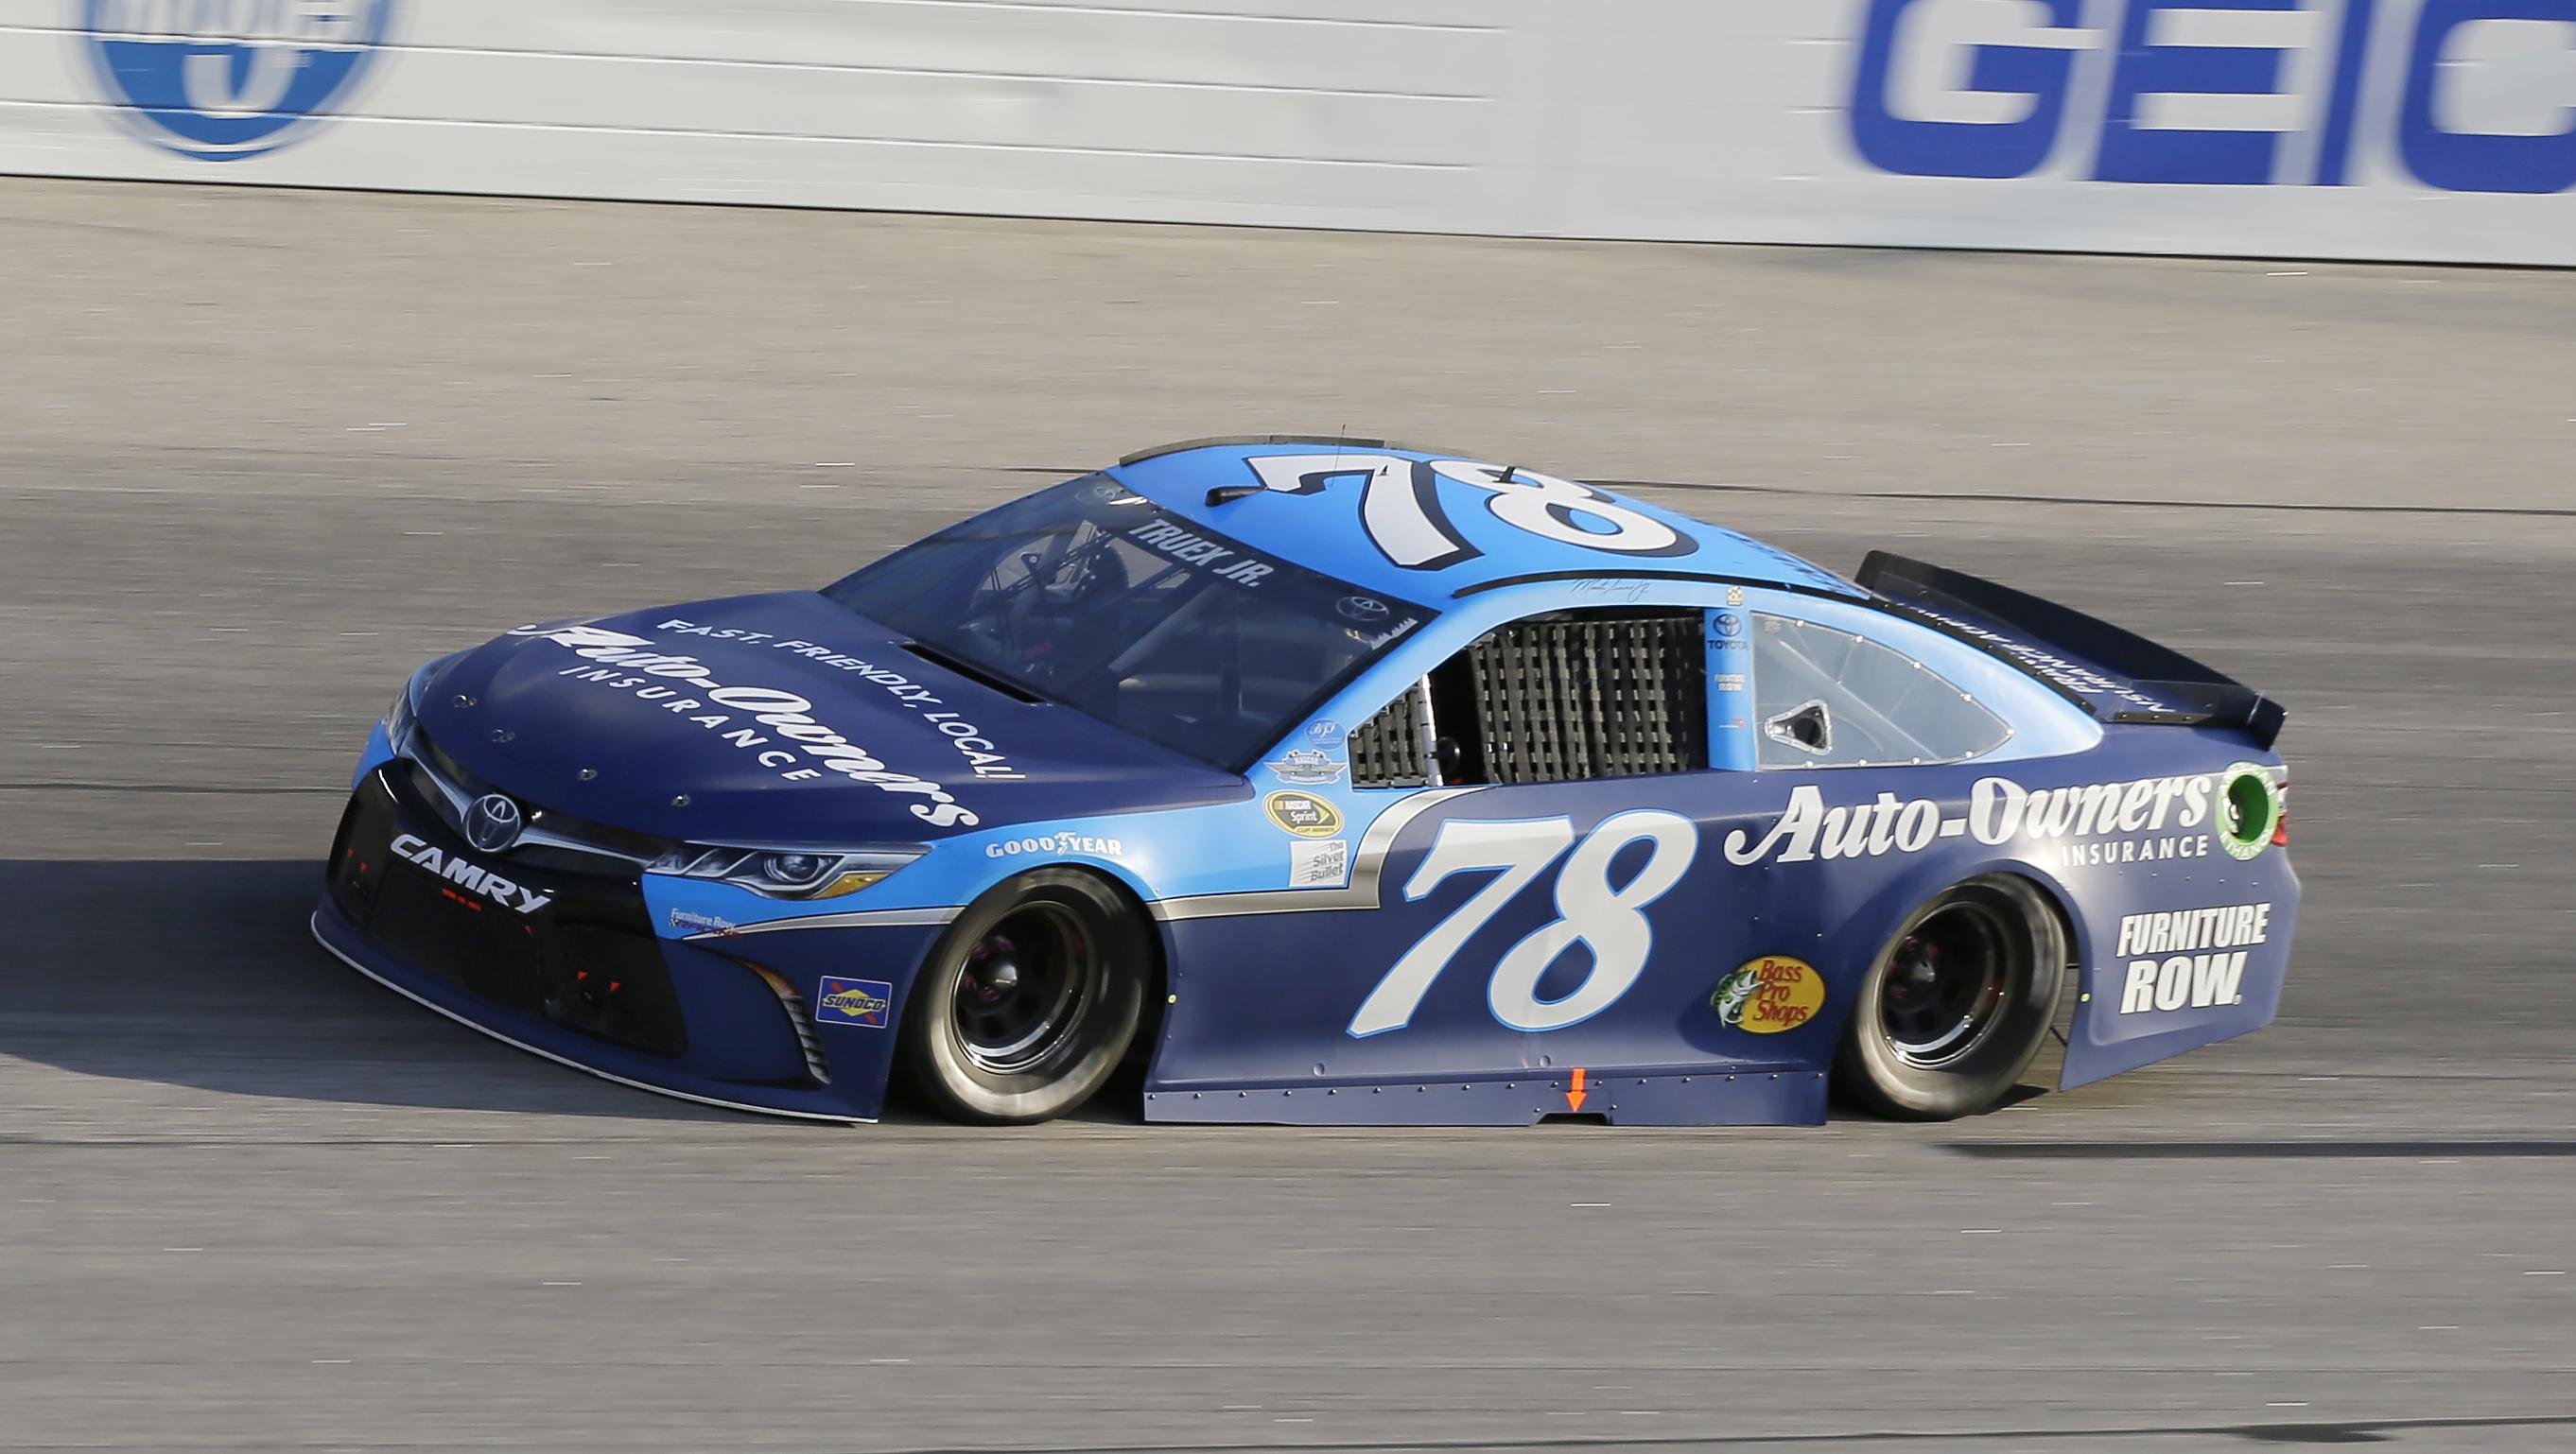 Martin Truex Jr. races into Turn 1 during the NASCAR Sprint Cup Series auto race at Darlington Raceway, Sunday, Sept. 4, 2016, in Darlington, S.C. (AP Photo/Terry Renna)